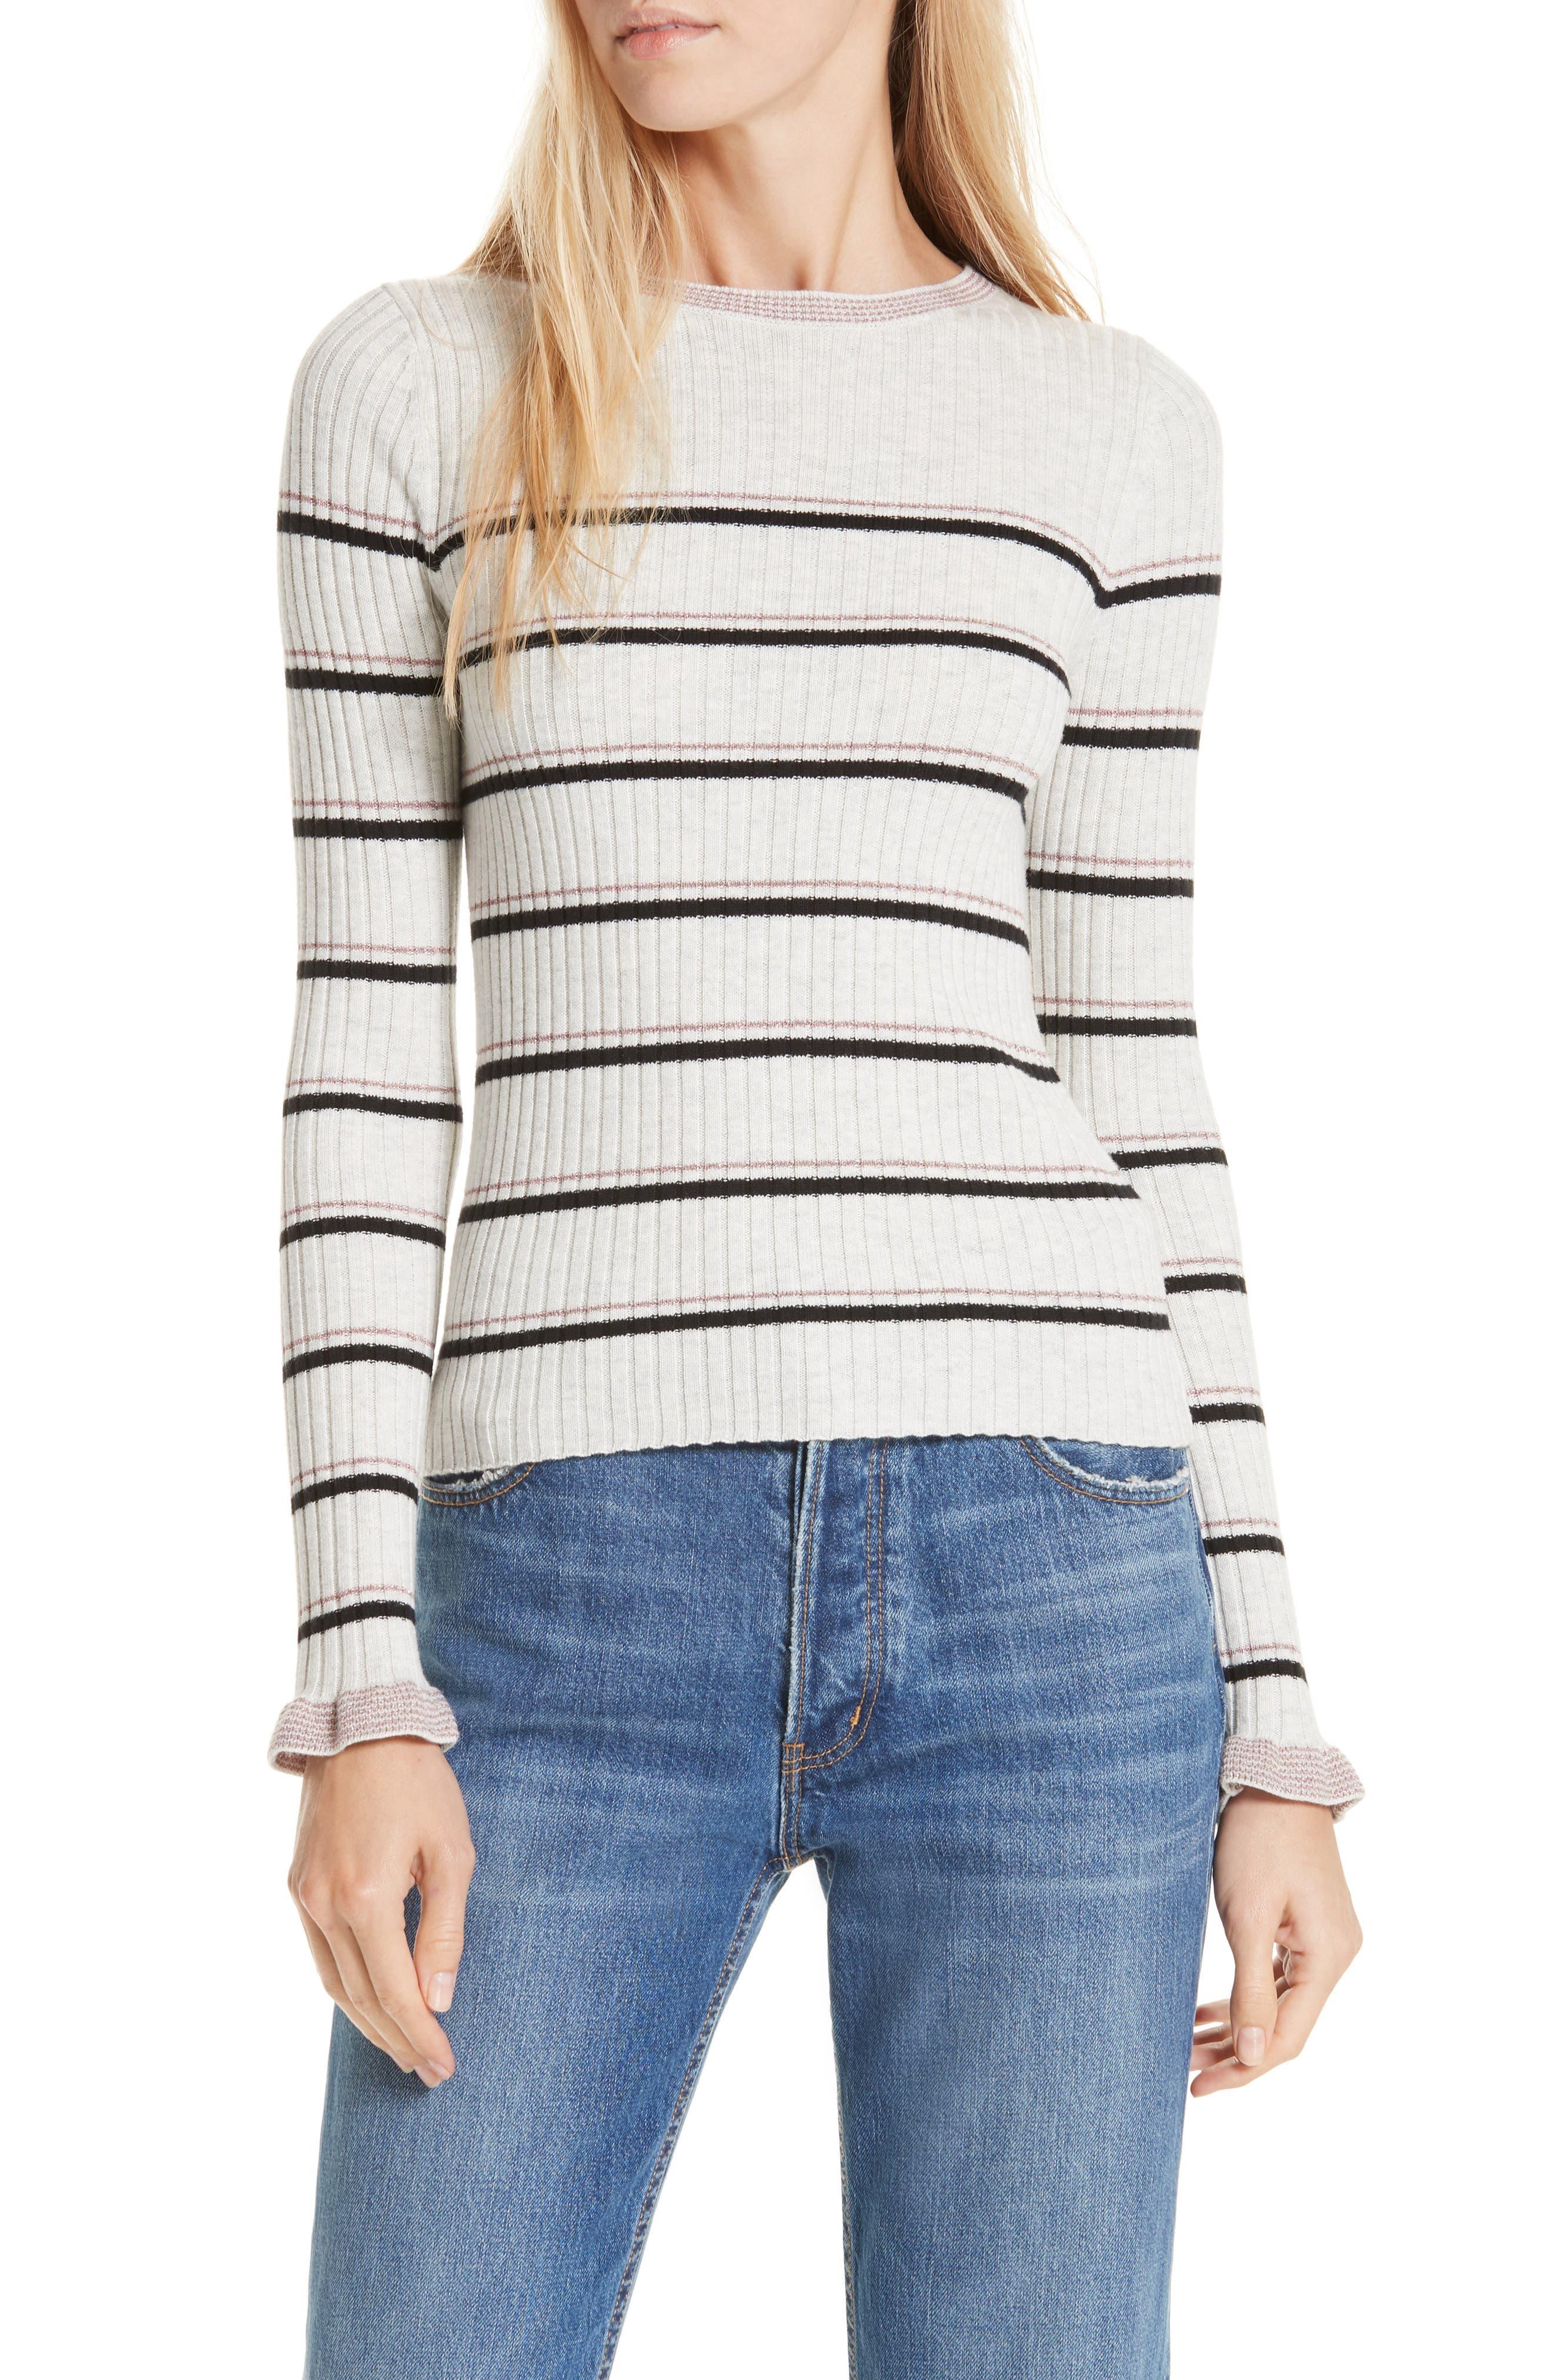 LA VIE REBECCA TAYLOR Cotton Wool Blend Stripe Sweater in Warm Heather Grey